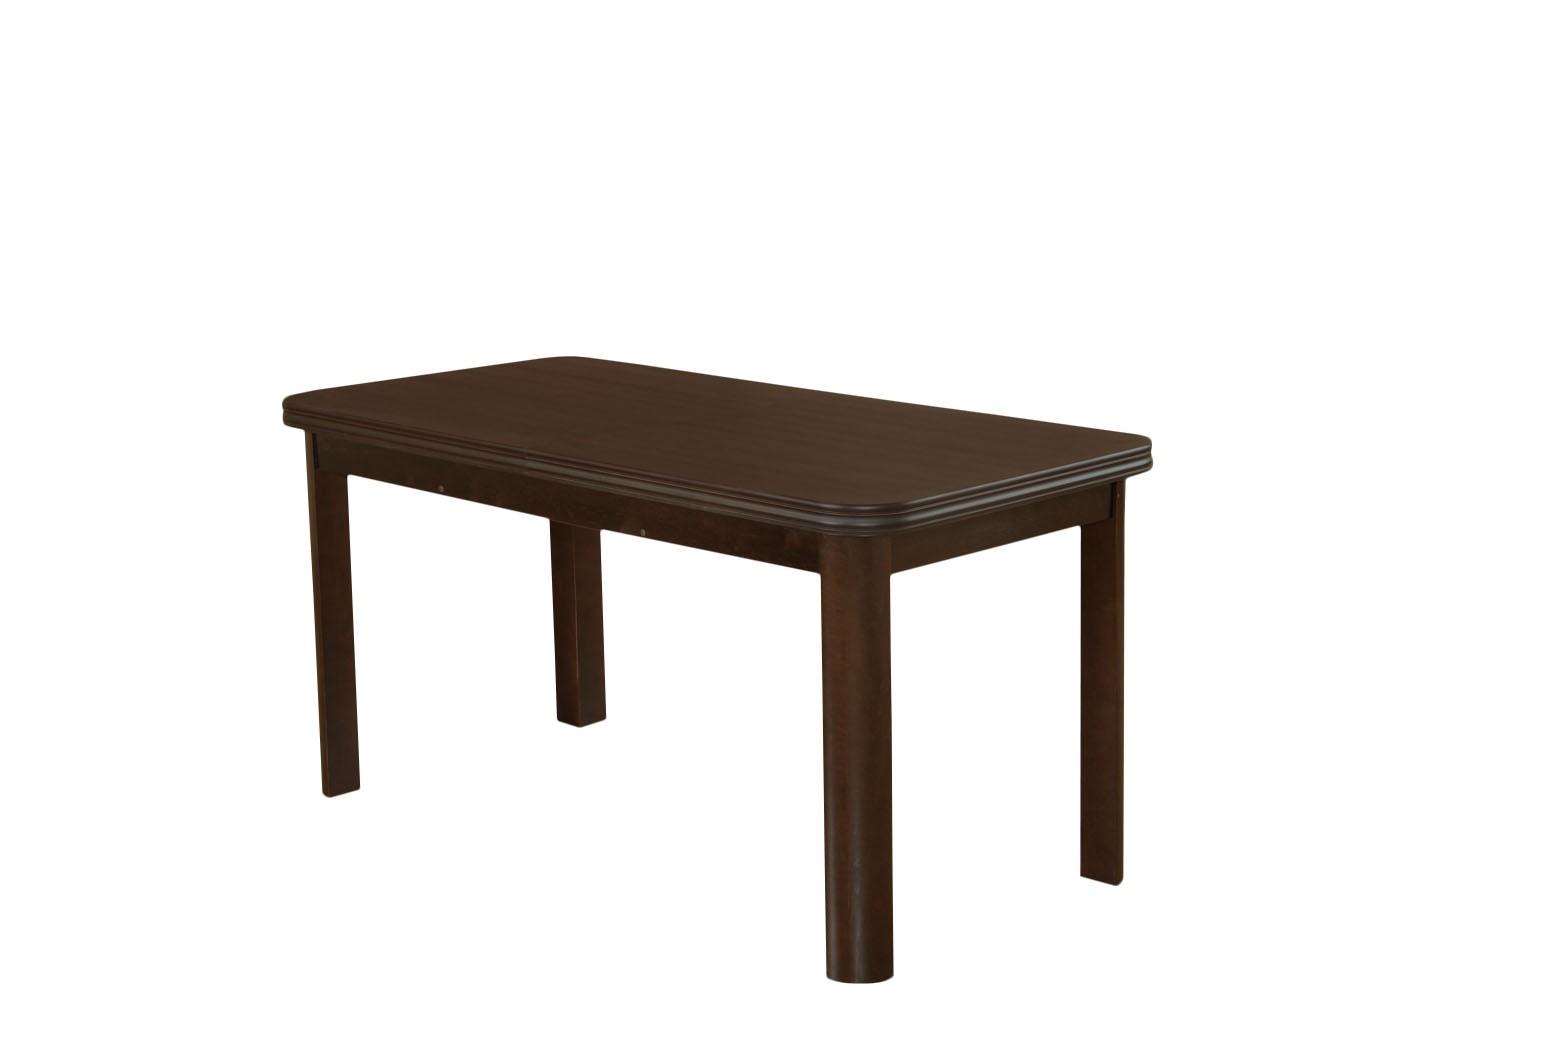 Stół SM14 na zaokrąglonych nogach z litego drewna rozkładany do 180 cm